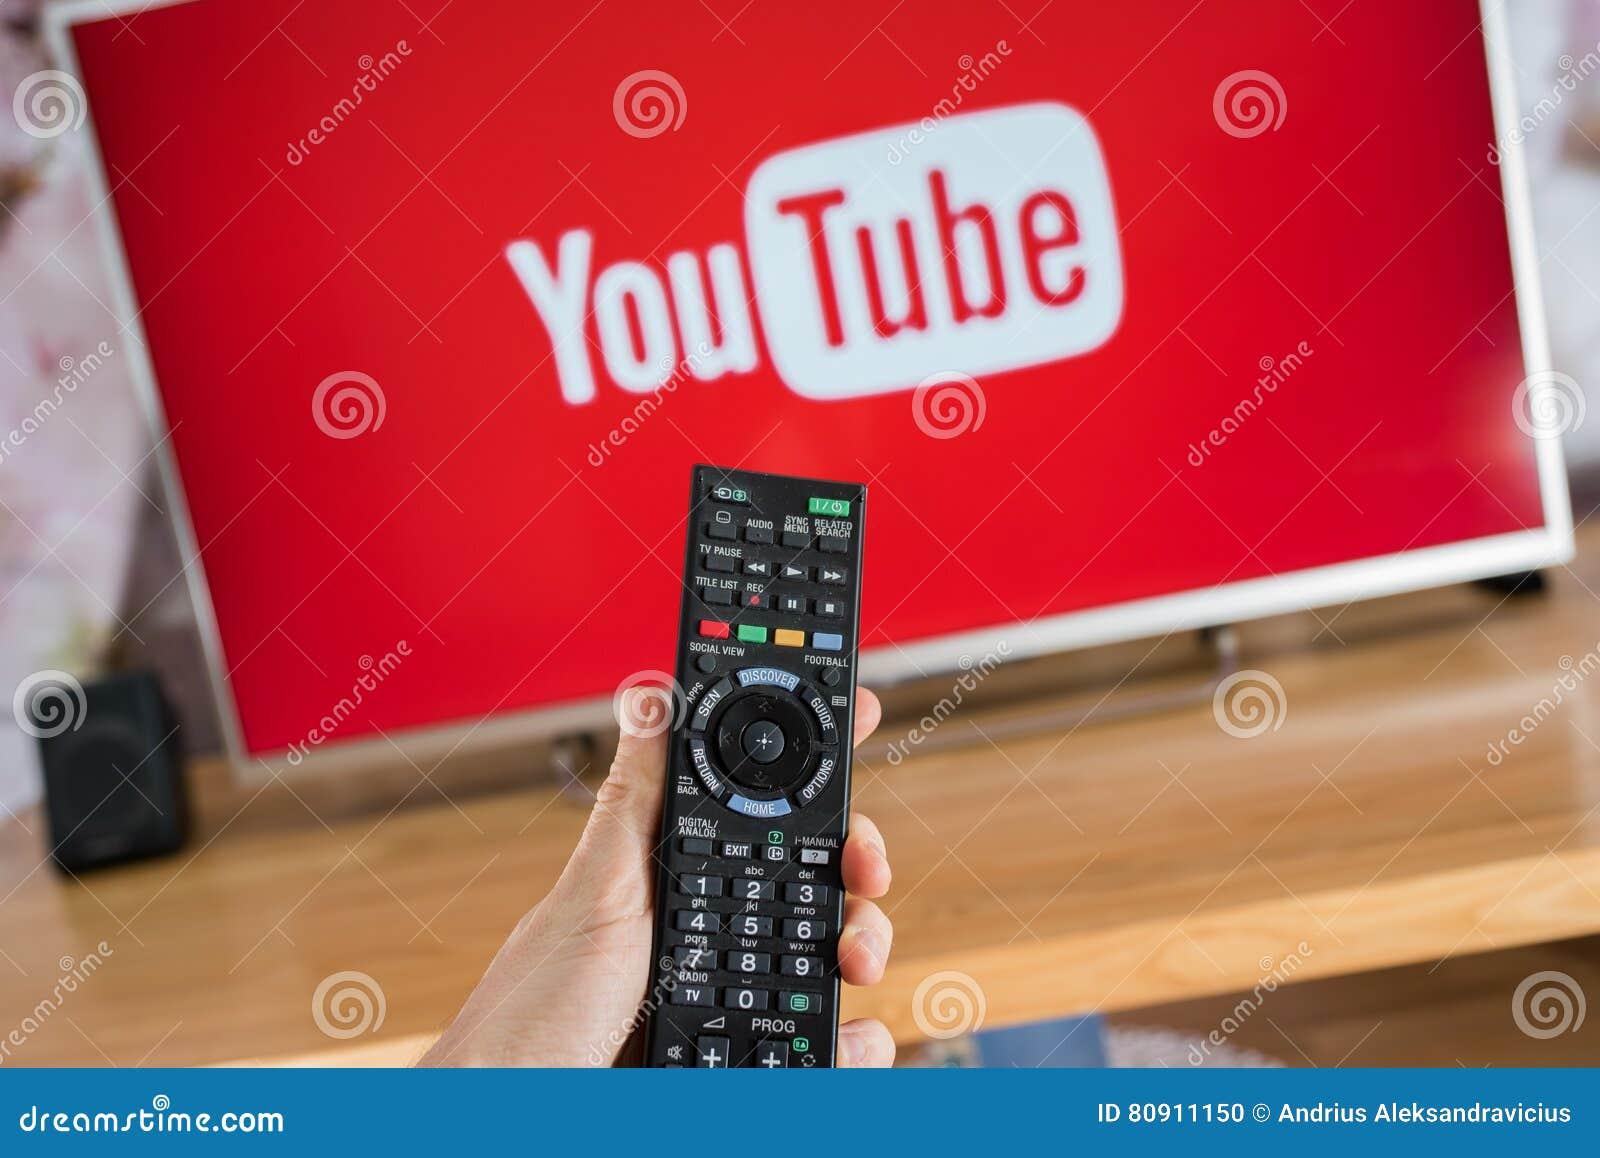 YouTube app on Sony smart TV